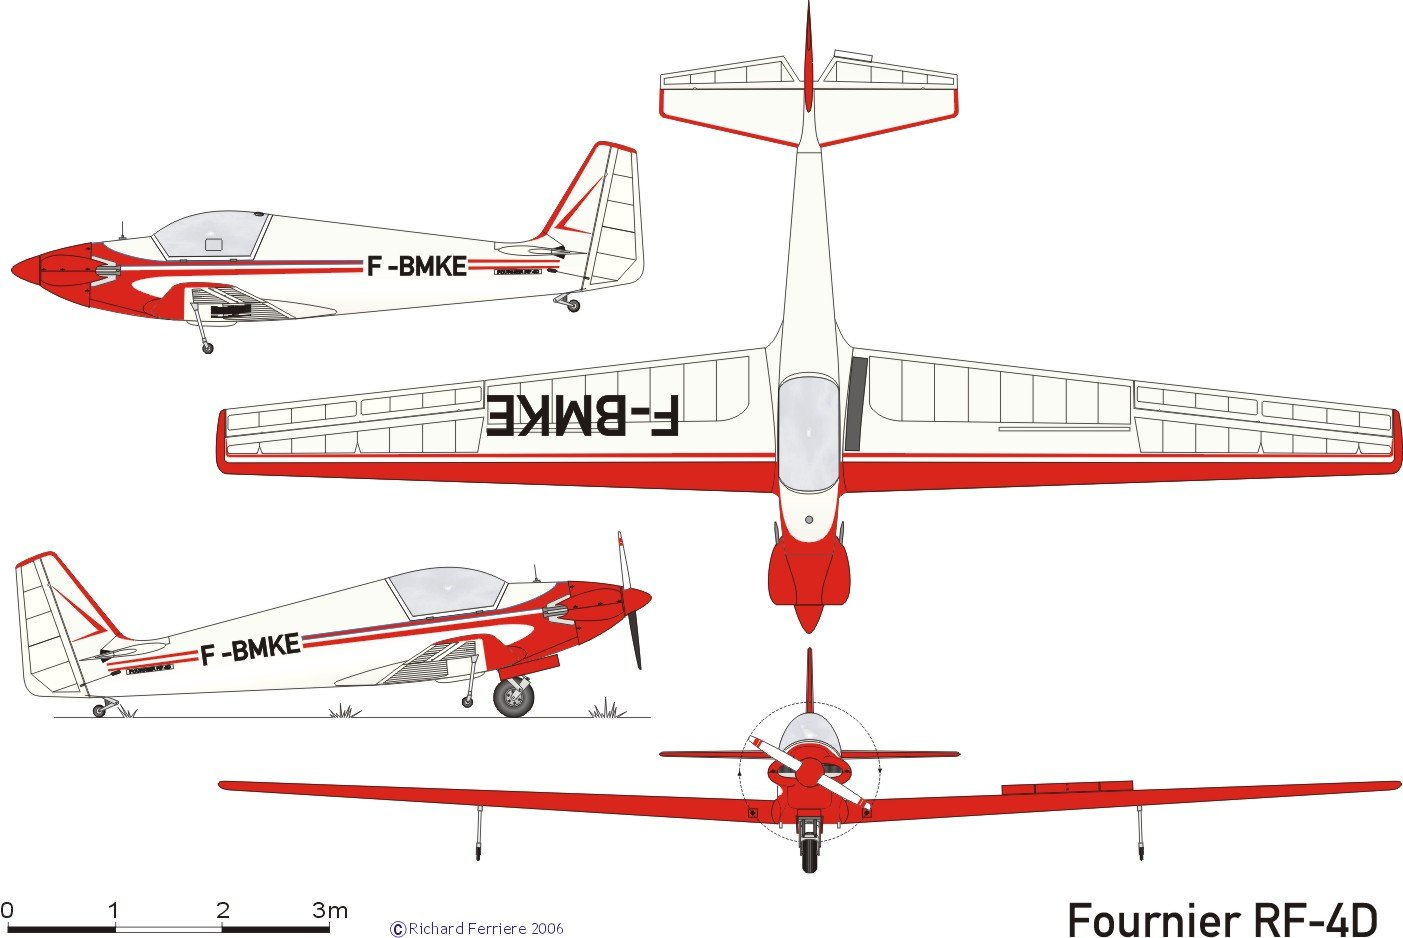 C F also Fournier Rf Folding Wing likewise Fournier Rf D Collin Gyenes Bob Brock besides D besides Fournier Rf D D Kant Baujahr. on fournier rf 4